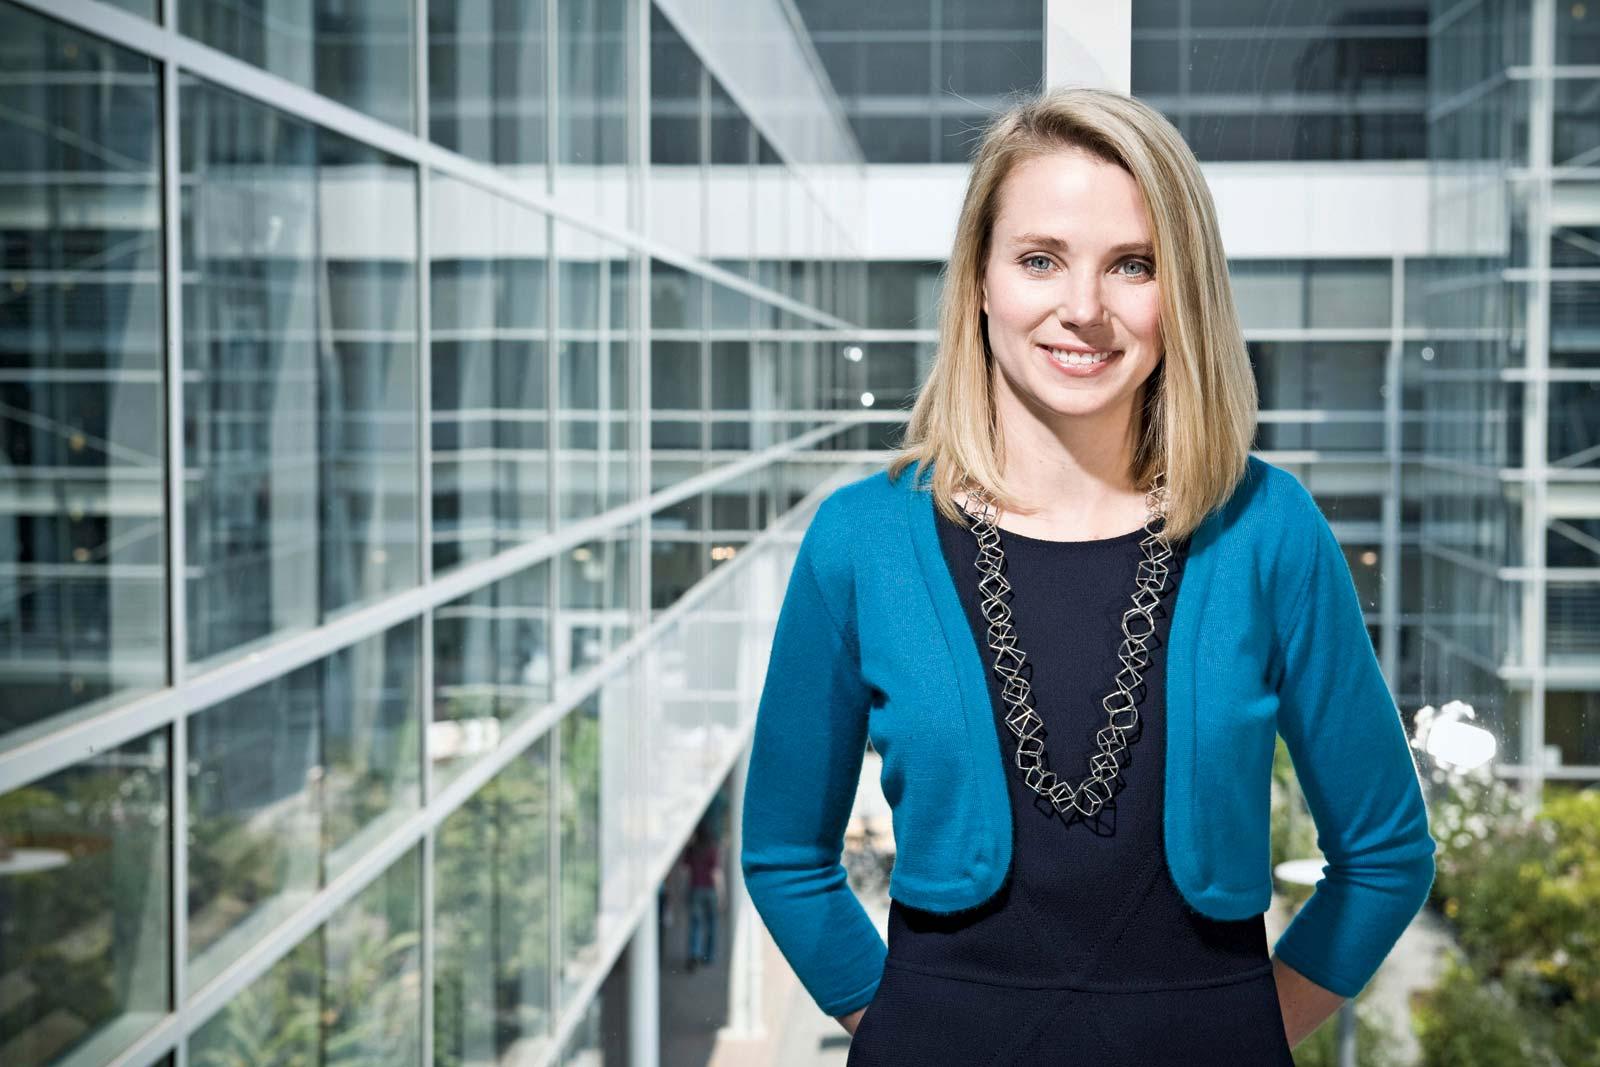 International Women in Engineering Day, Marissa Mayer